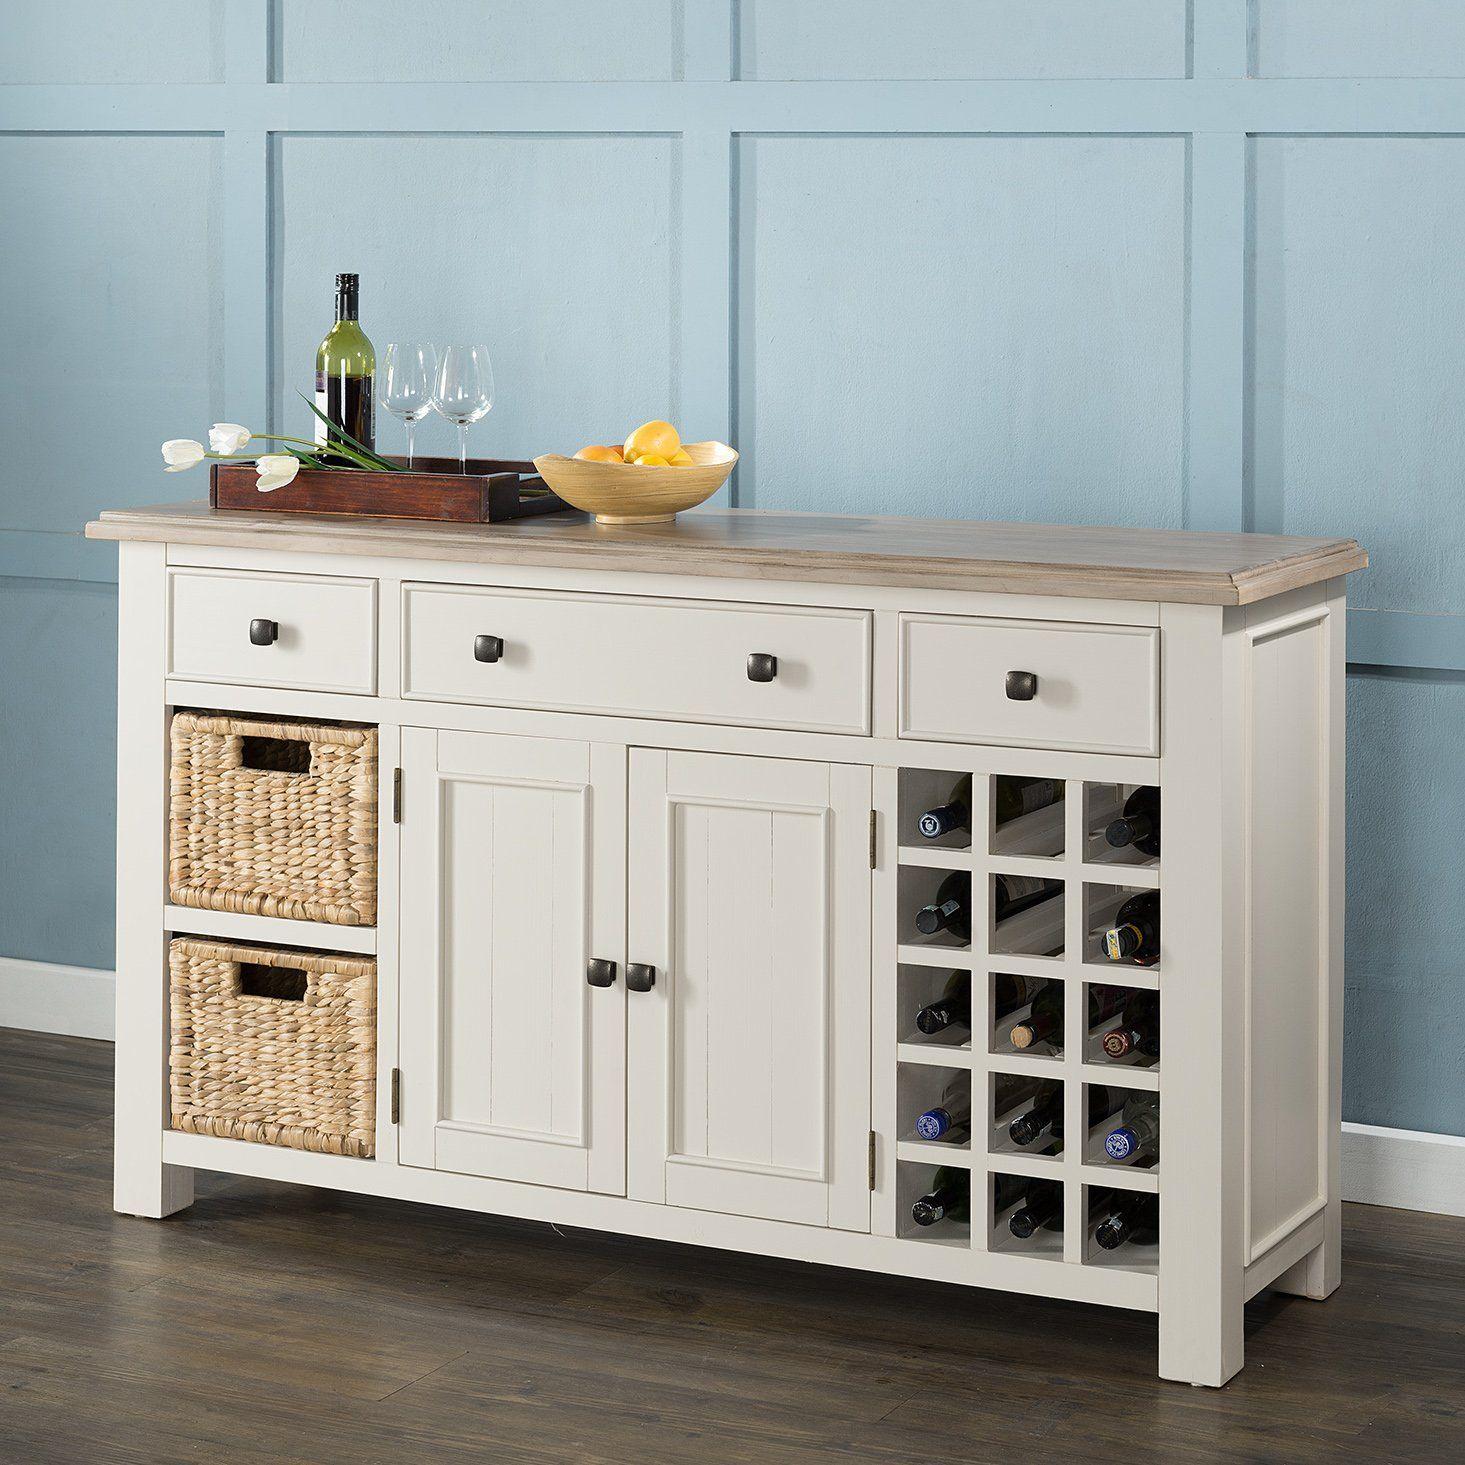 Hampton Large Sideboard - Wine Rack/Baskets | Sideboards | Pinterest ...